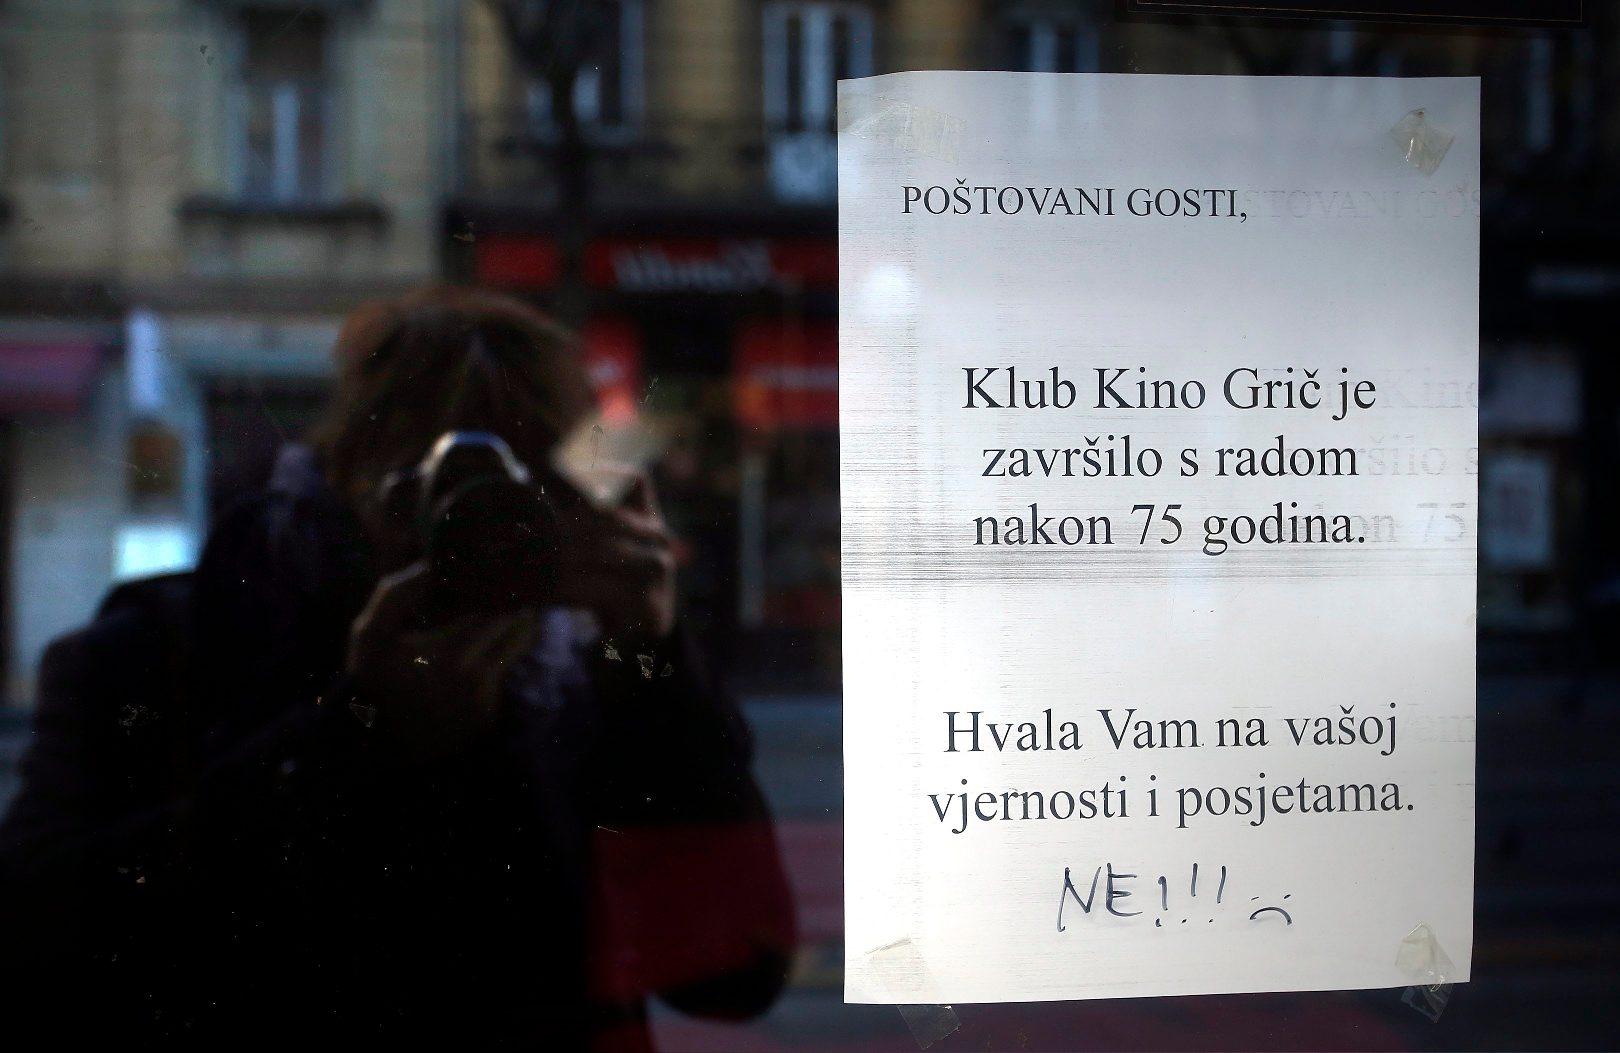 Zagreb,120119. Jurisiceva ulica. Kino Gric nakon 75 godina prestaje s radom. Foto: Damjan Tadic / CROPIX